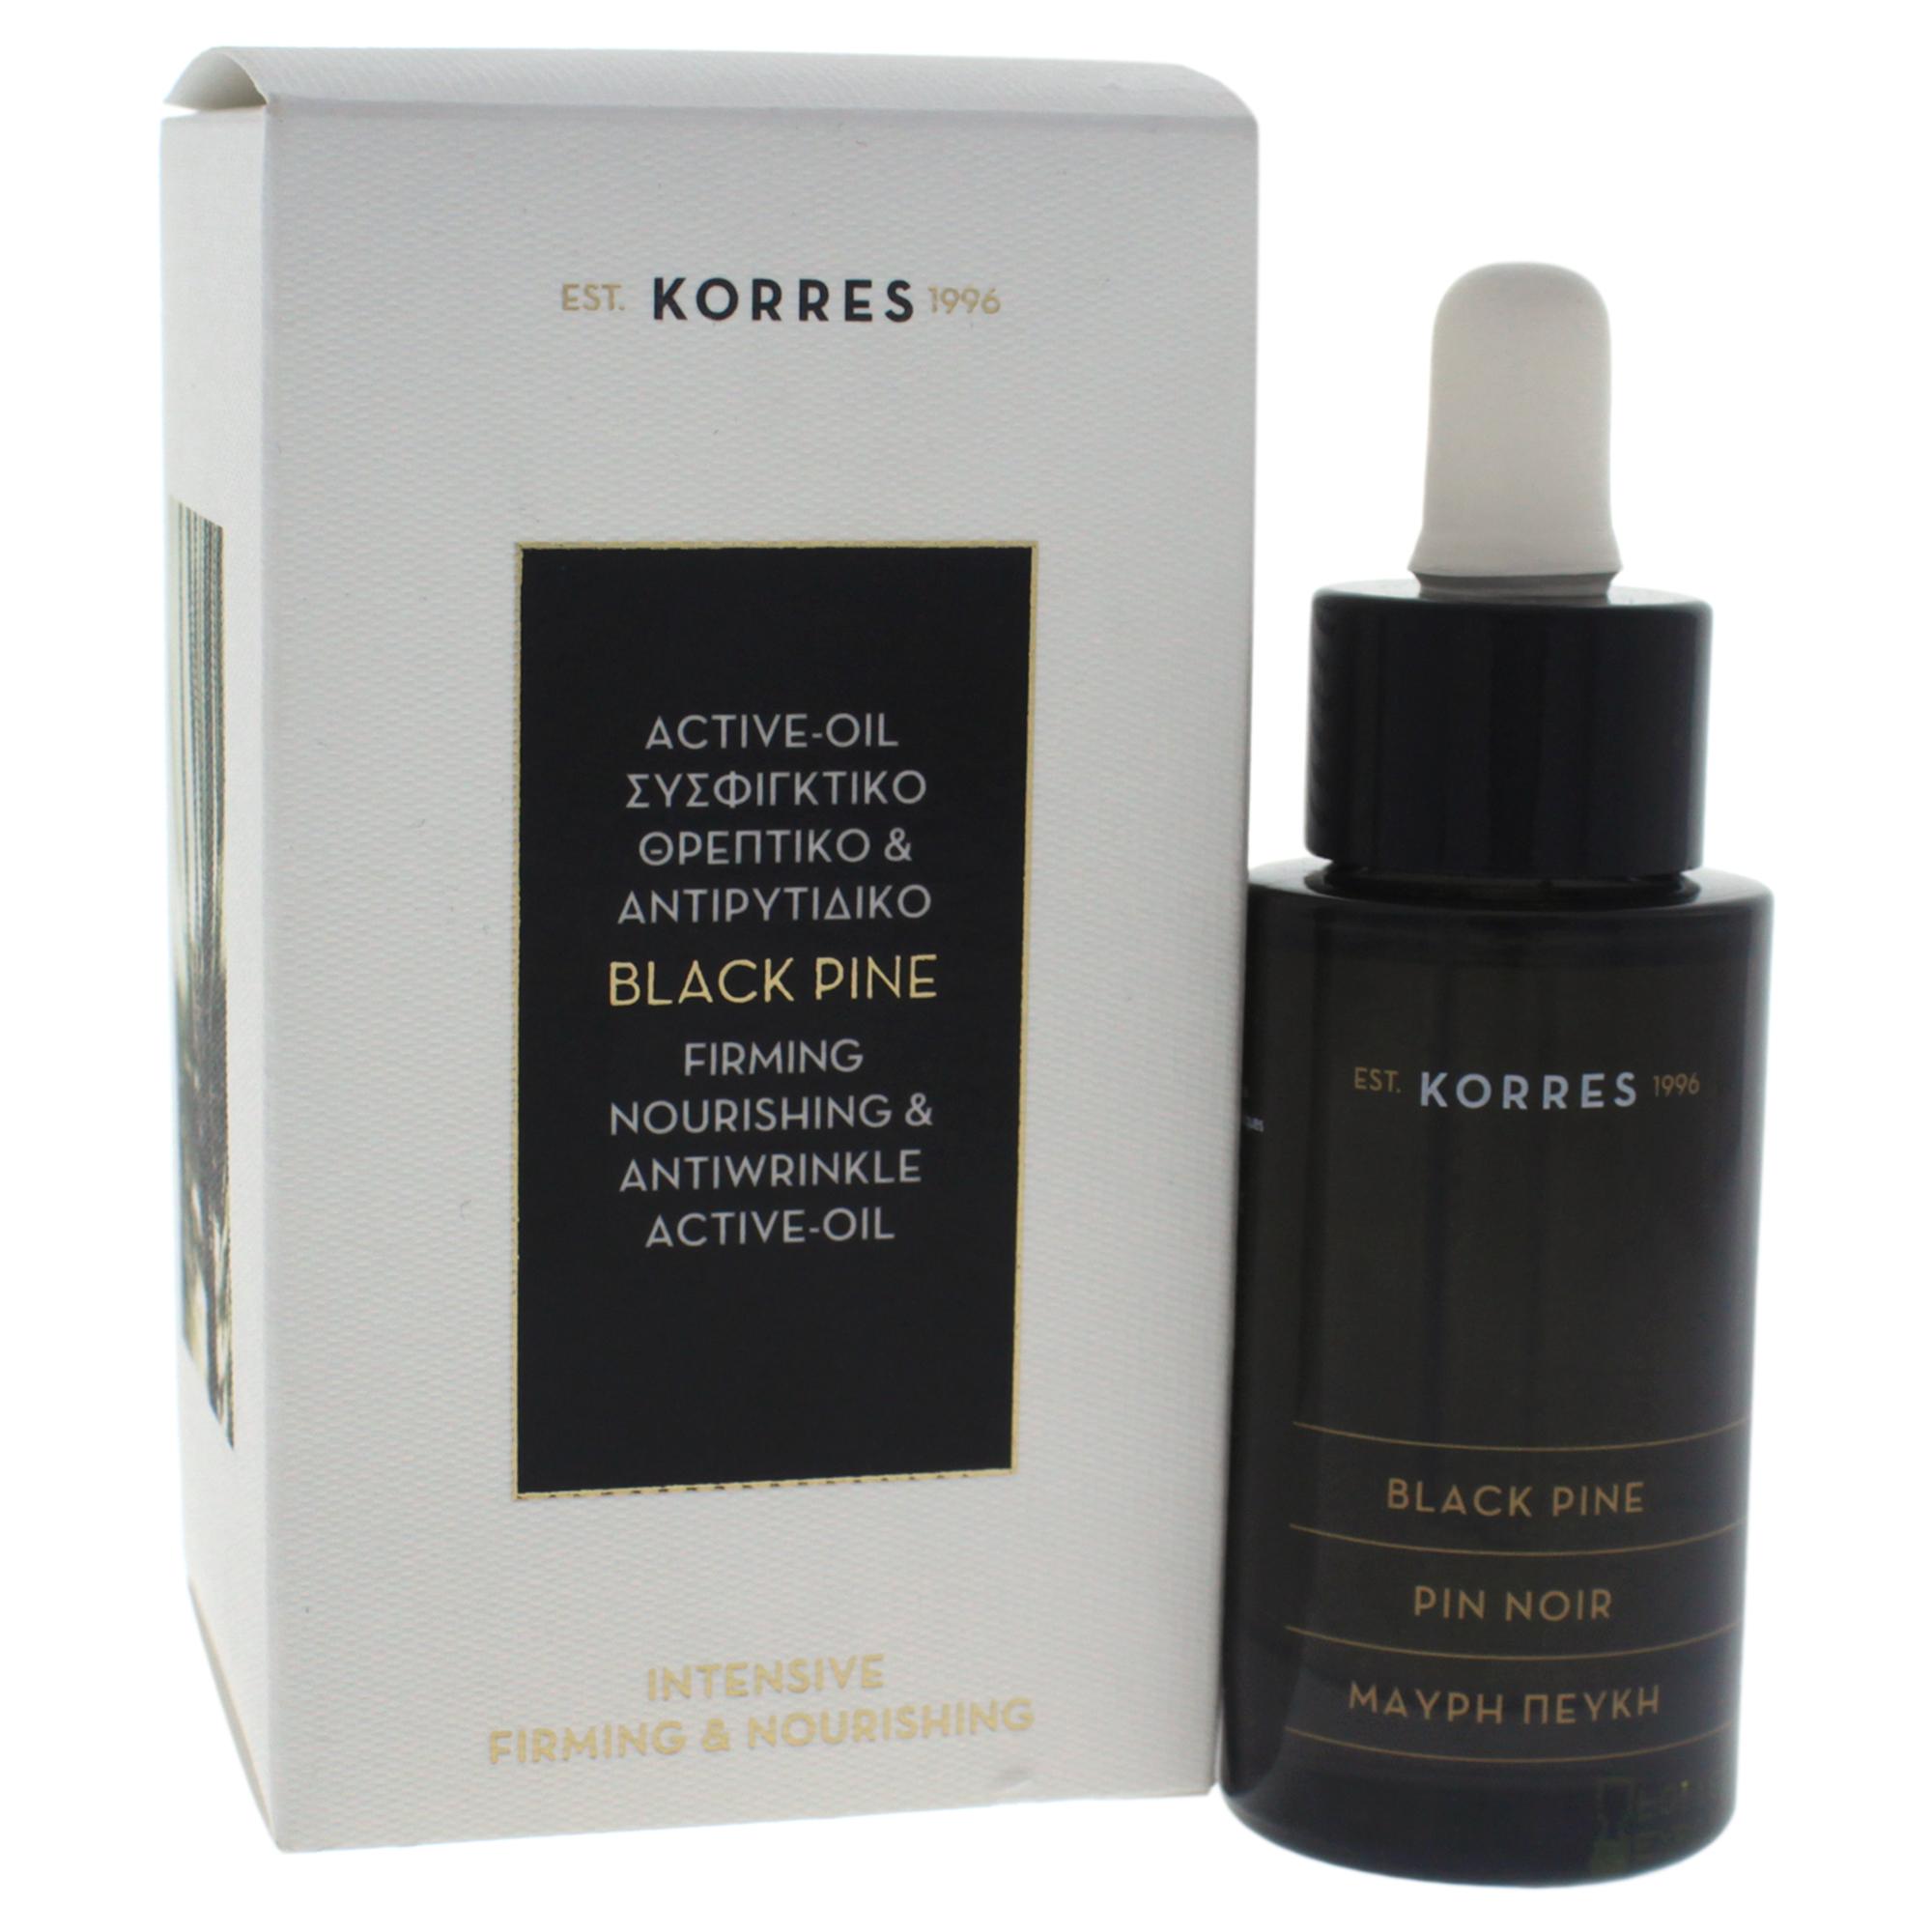 Black Pine Firming Nourishing & Antiwrinkle Active Oil by Korres for Unisex - 1.01 oz Oil